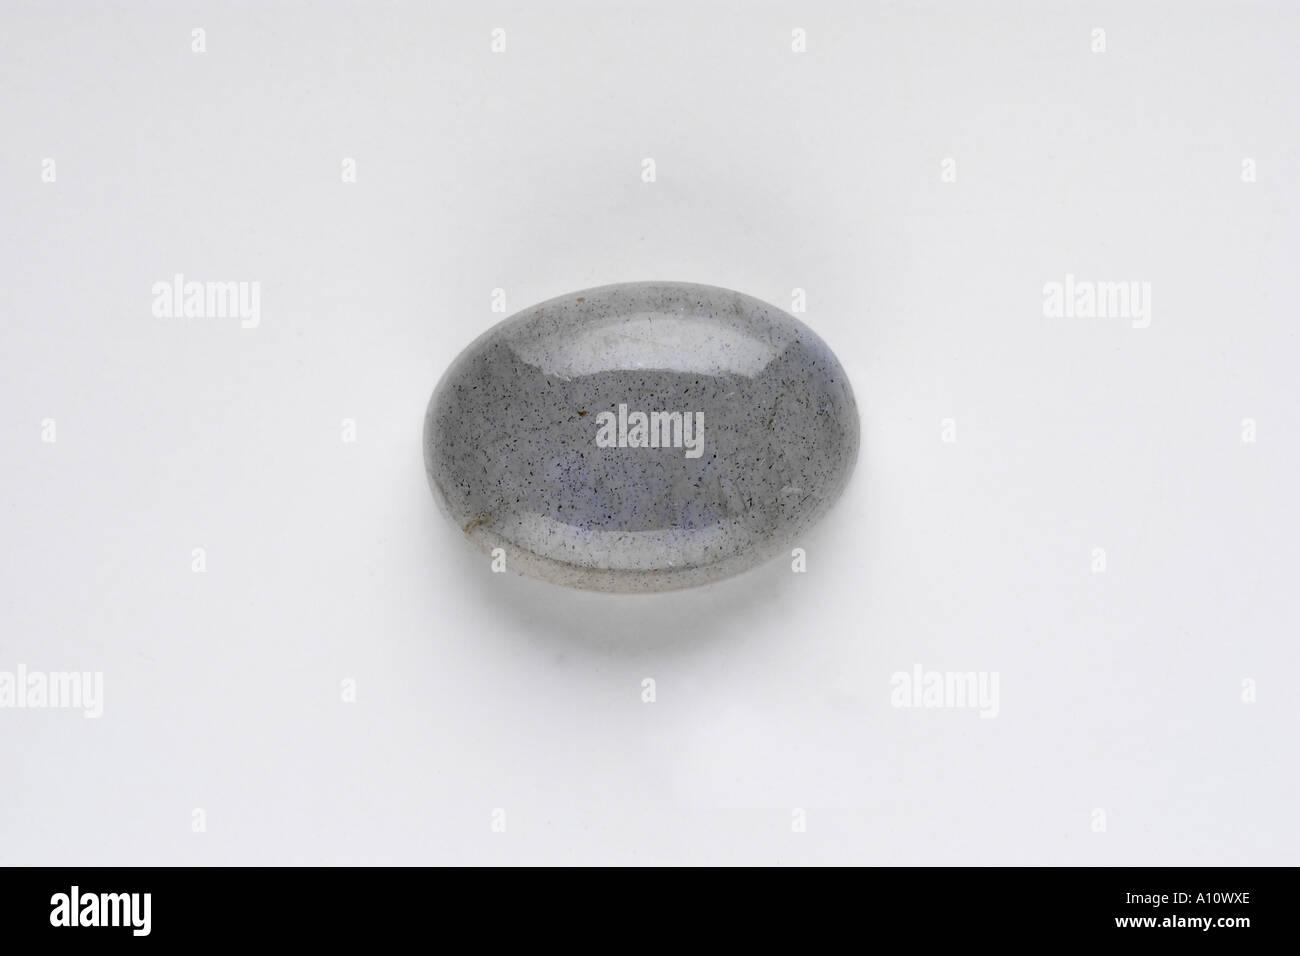 UGA75759 Moon Stone Grey Semi Precious Stones - Stock Image